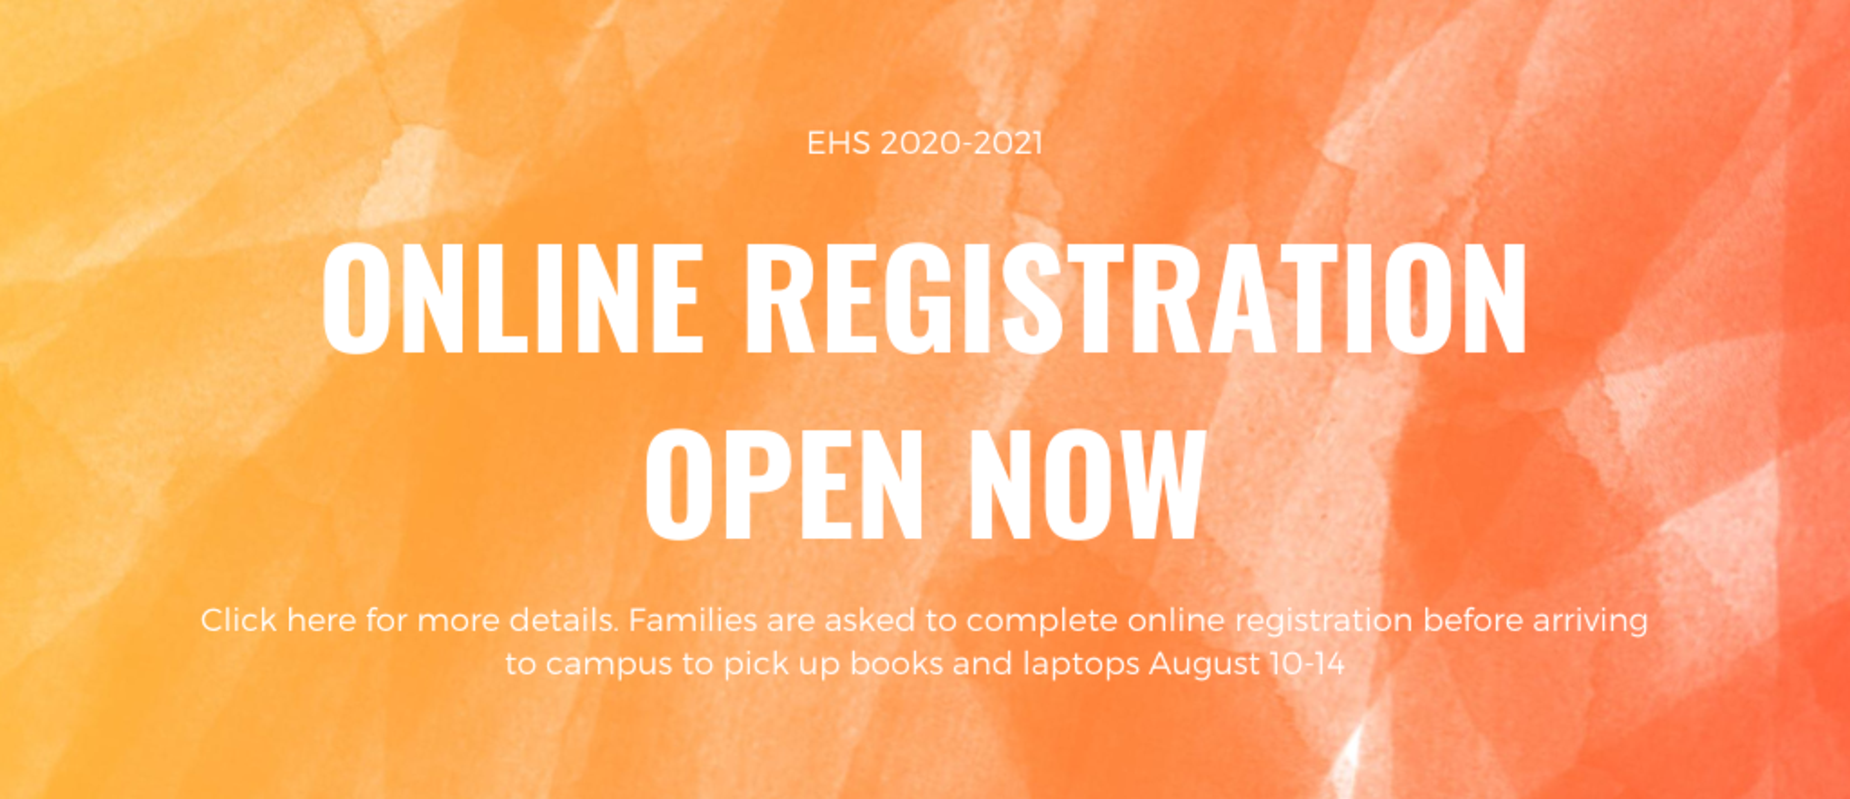 online registration open now